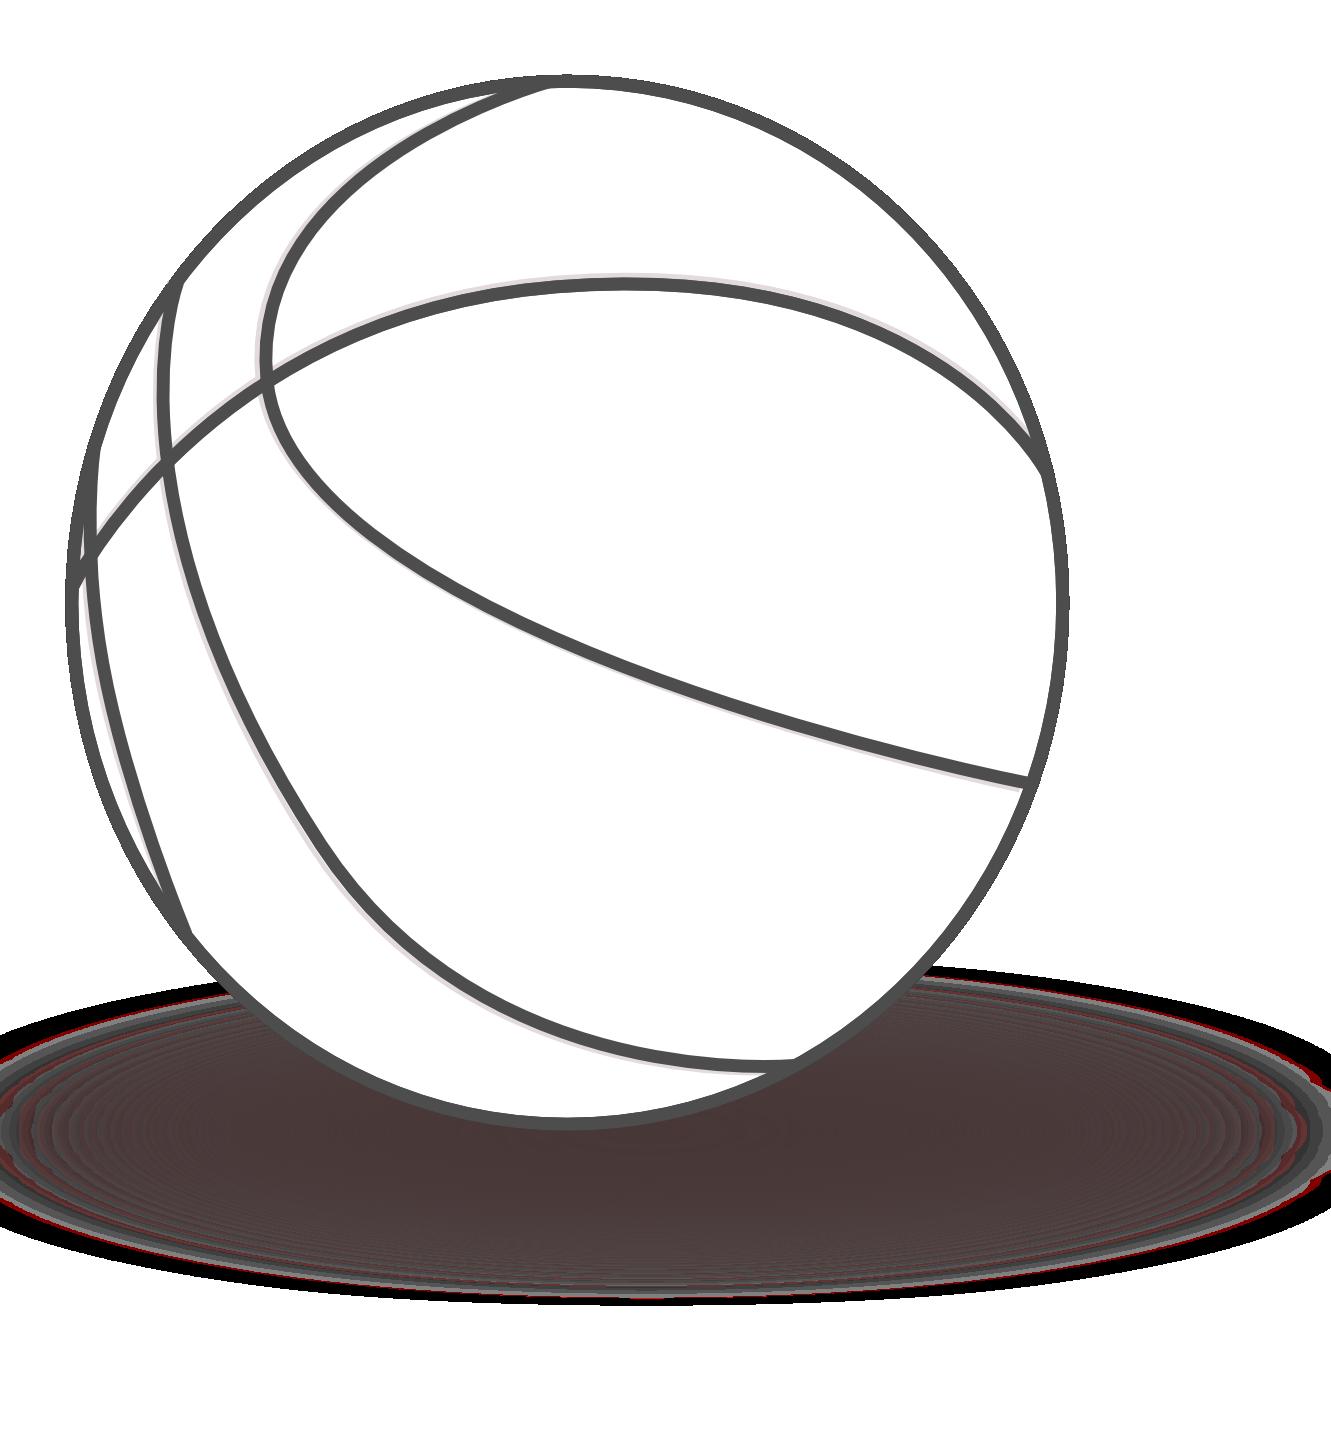 Basketball court black and white clipart jpg free stock Basketball court Black Clip art - basketball court 1331*1451 ... jpg free stock